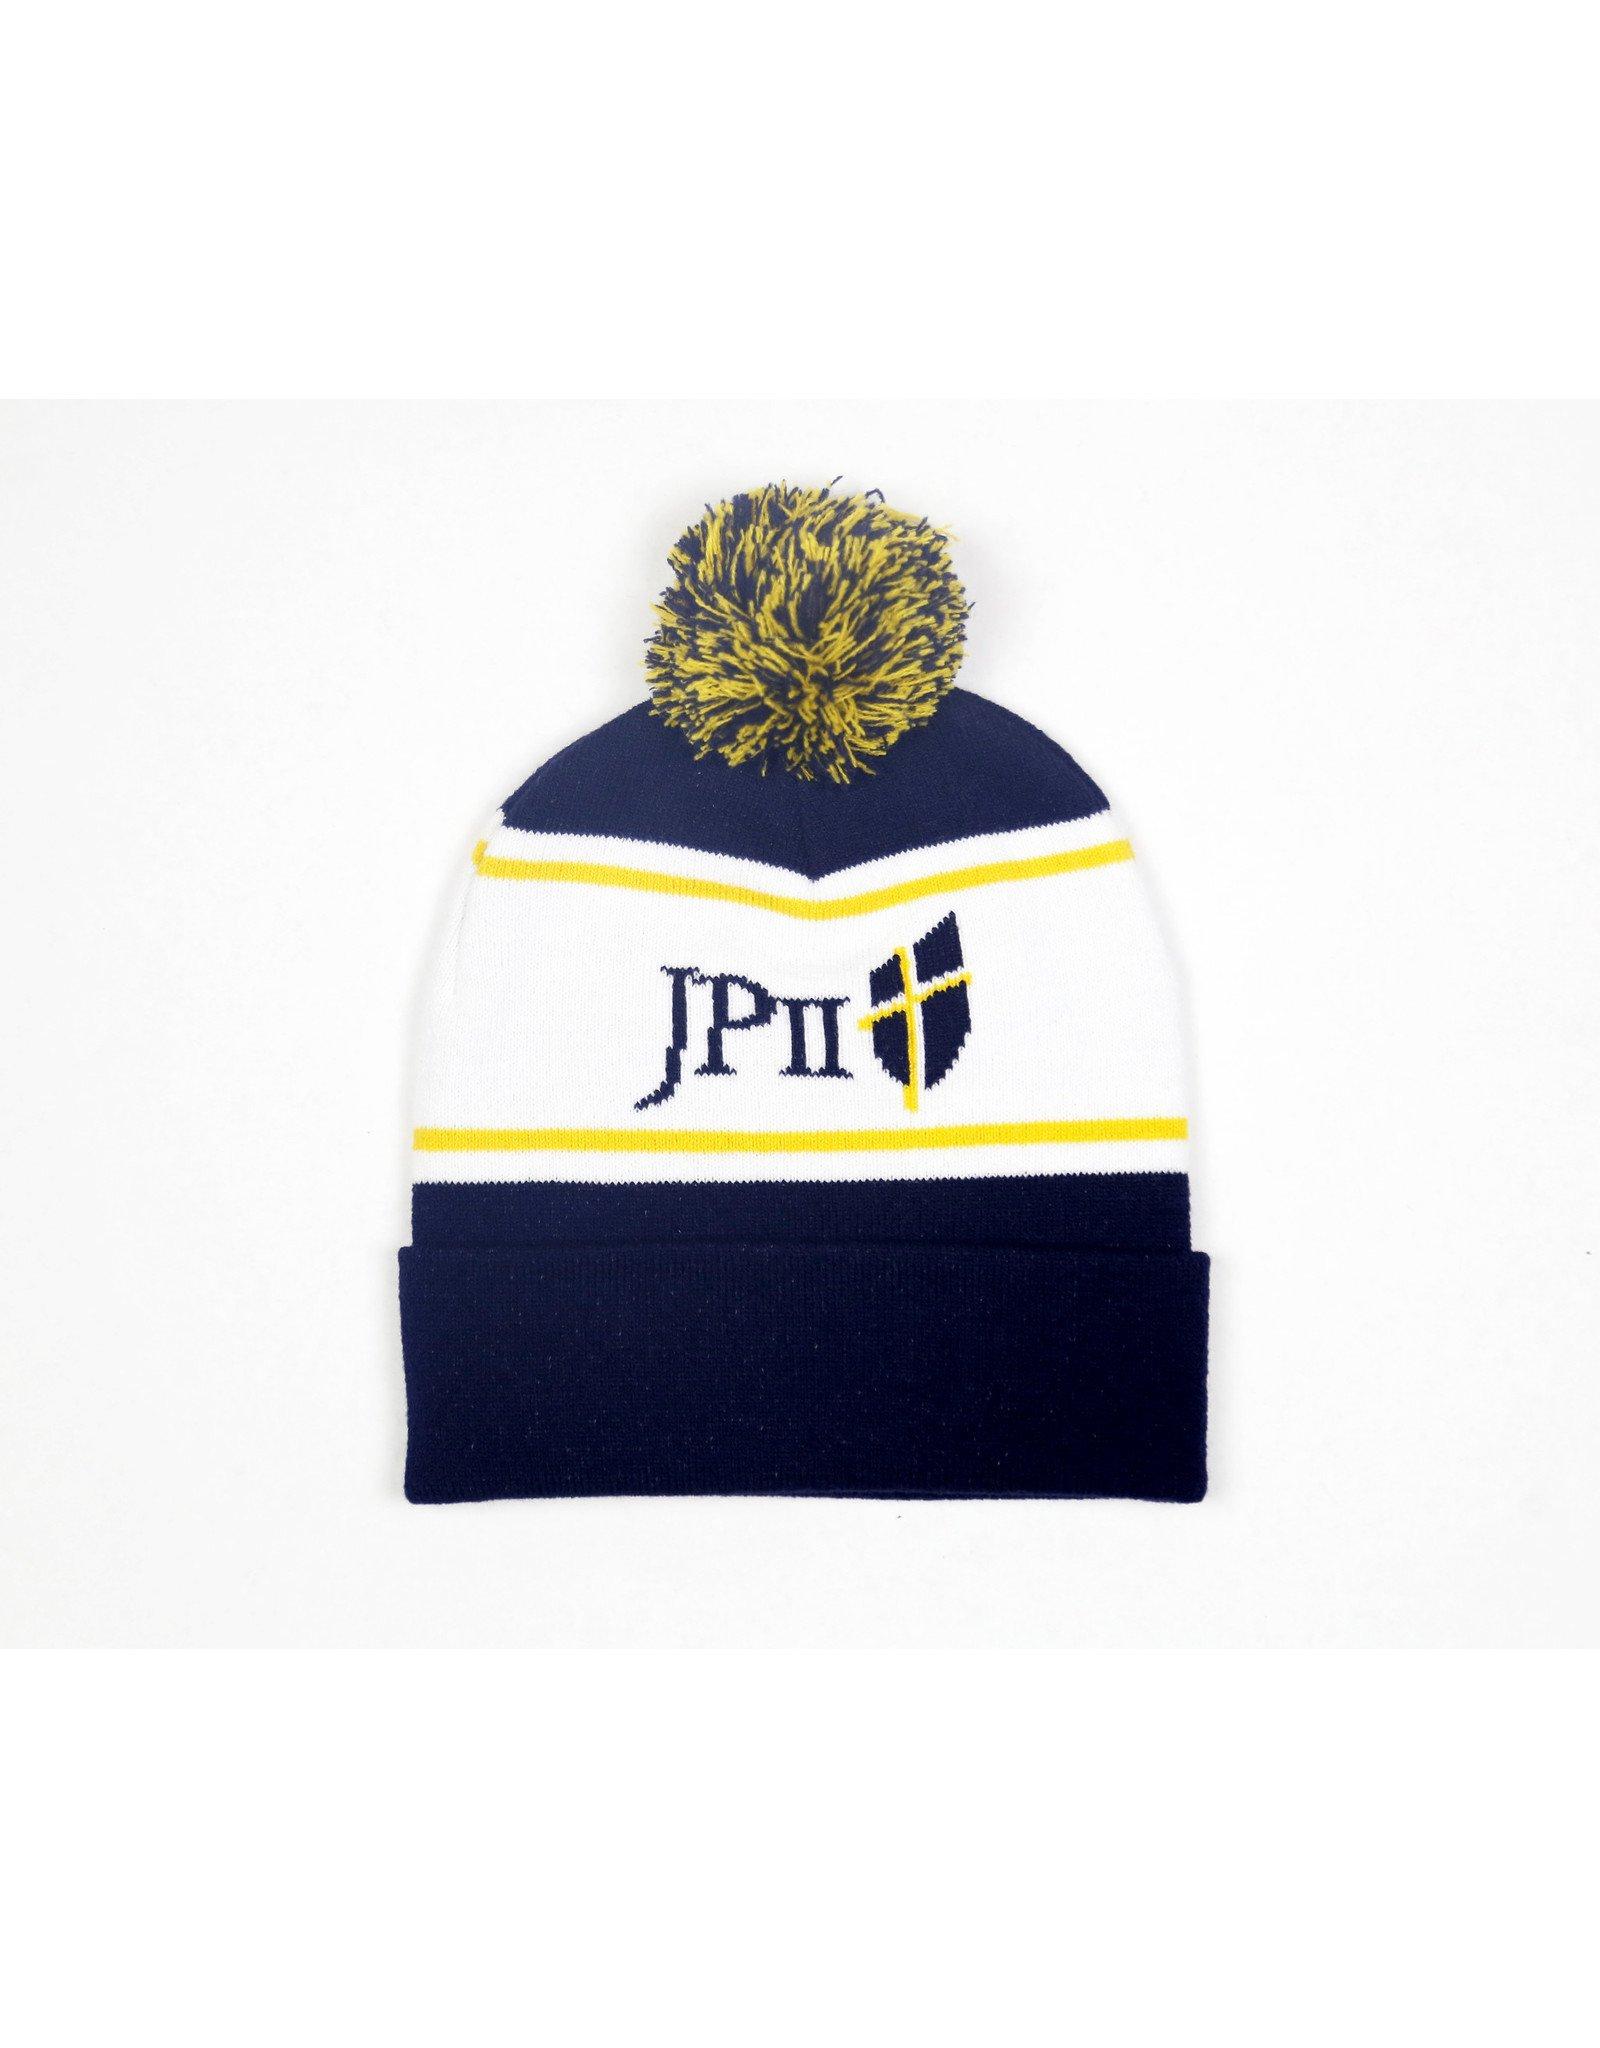 Blue and Gold Bam Bam Beanie Hat